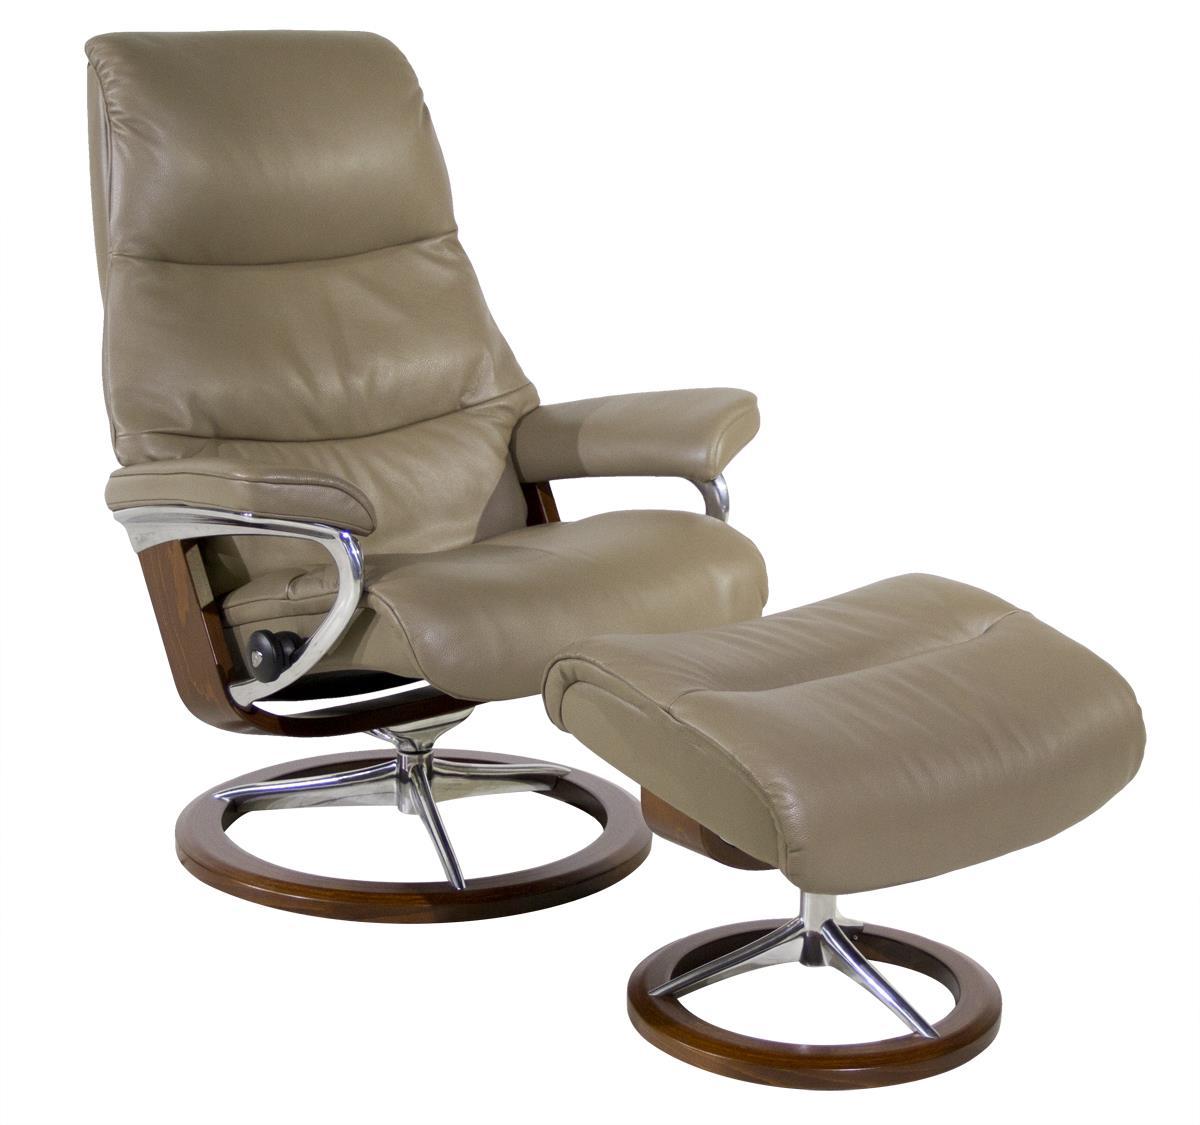 Stressless By Ekornes View Medium Stressless Chair U0026 Ottoman   Item Number:  View